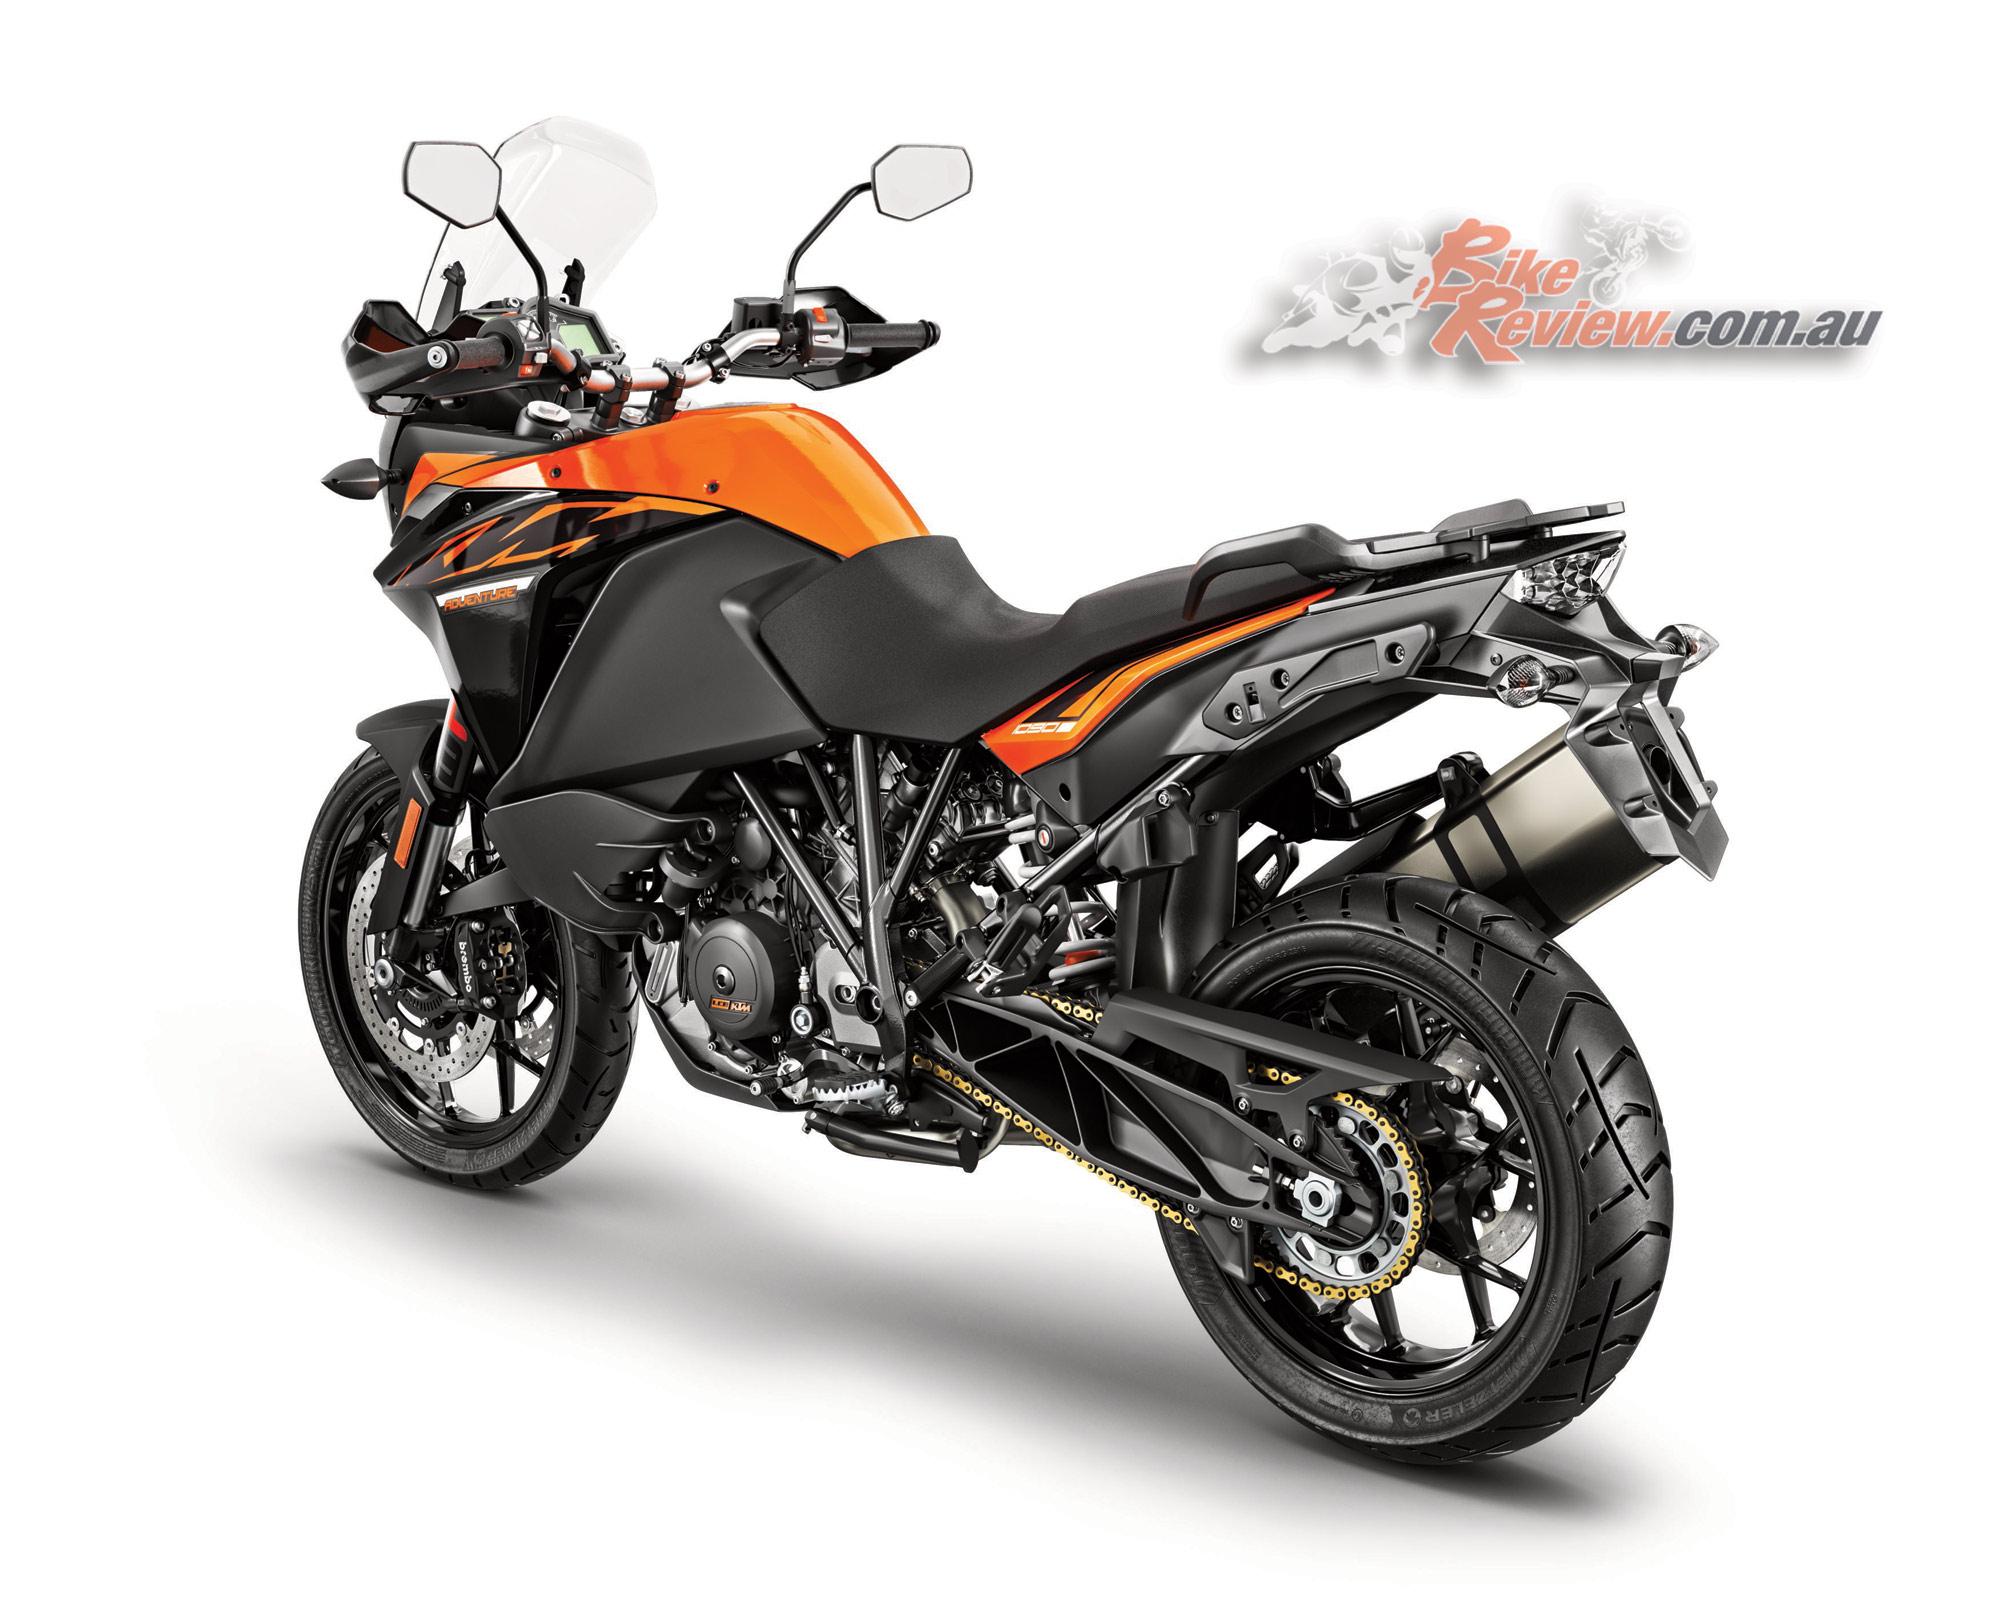 2017 Ktm 1090 Adventure Revealed Bike Review